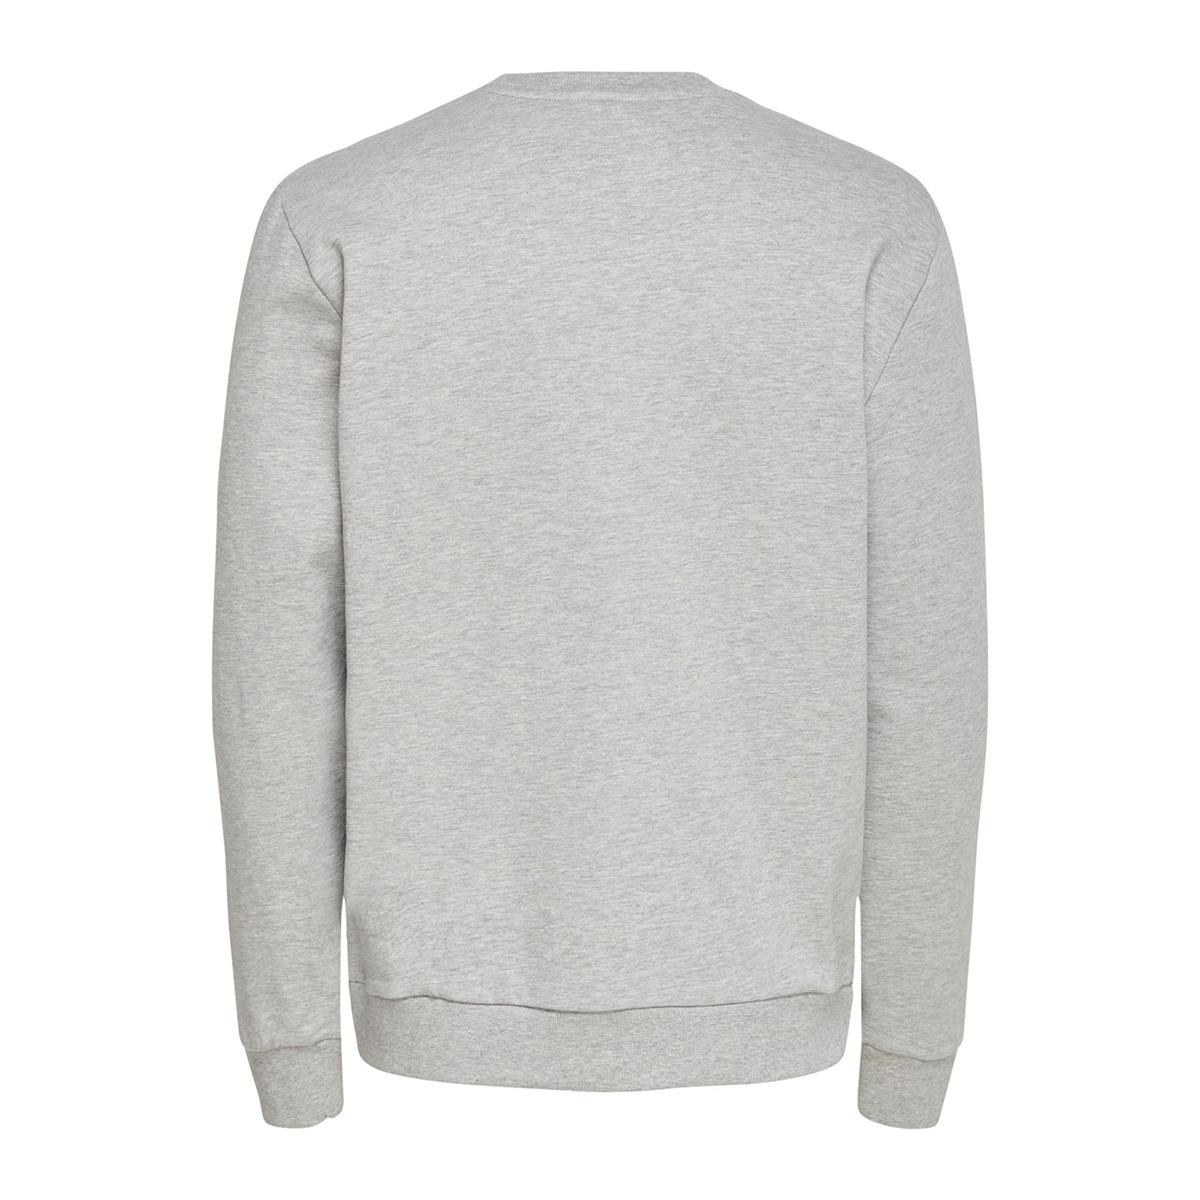 onselements reg chest emb crew 22016060 only & sons sweater light grey/melange